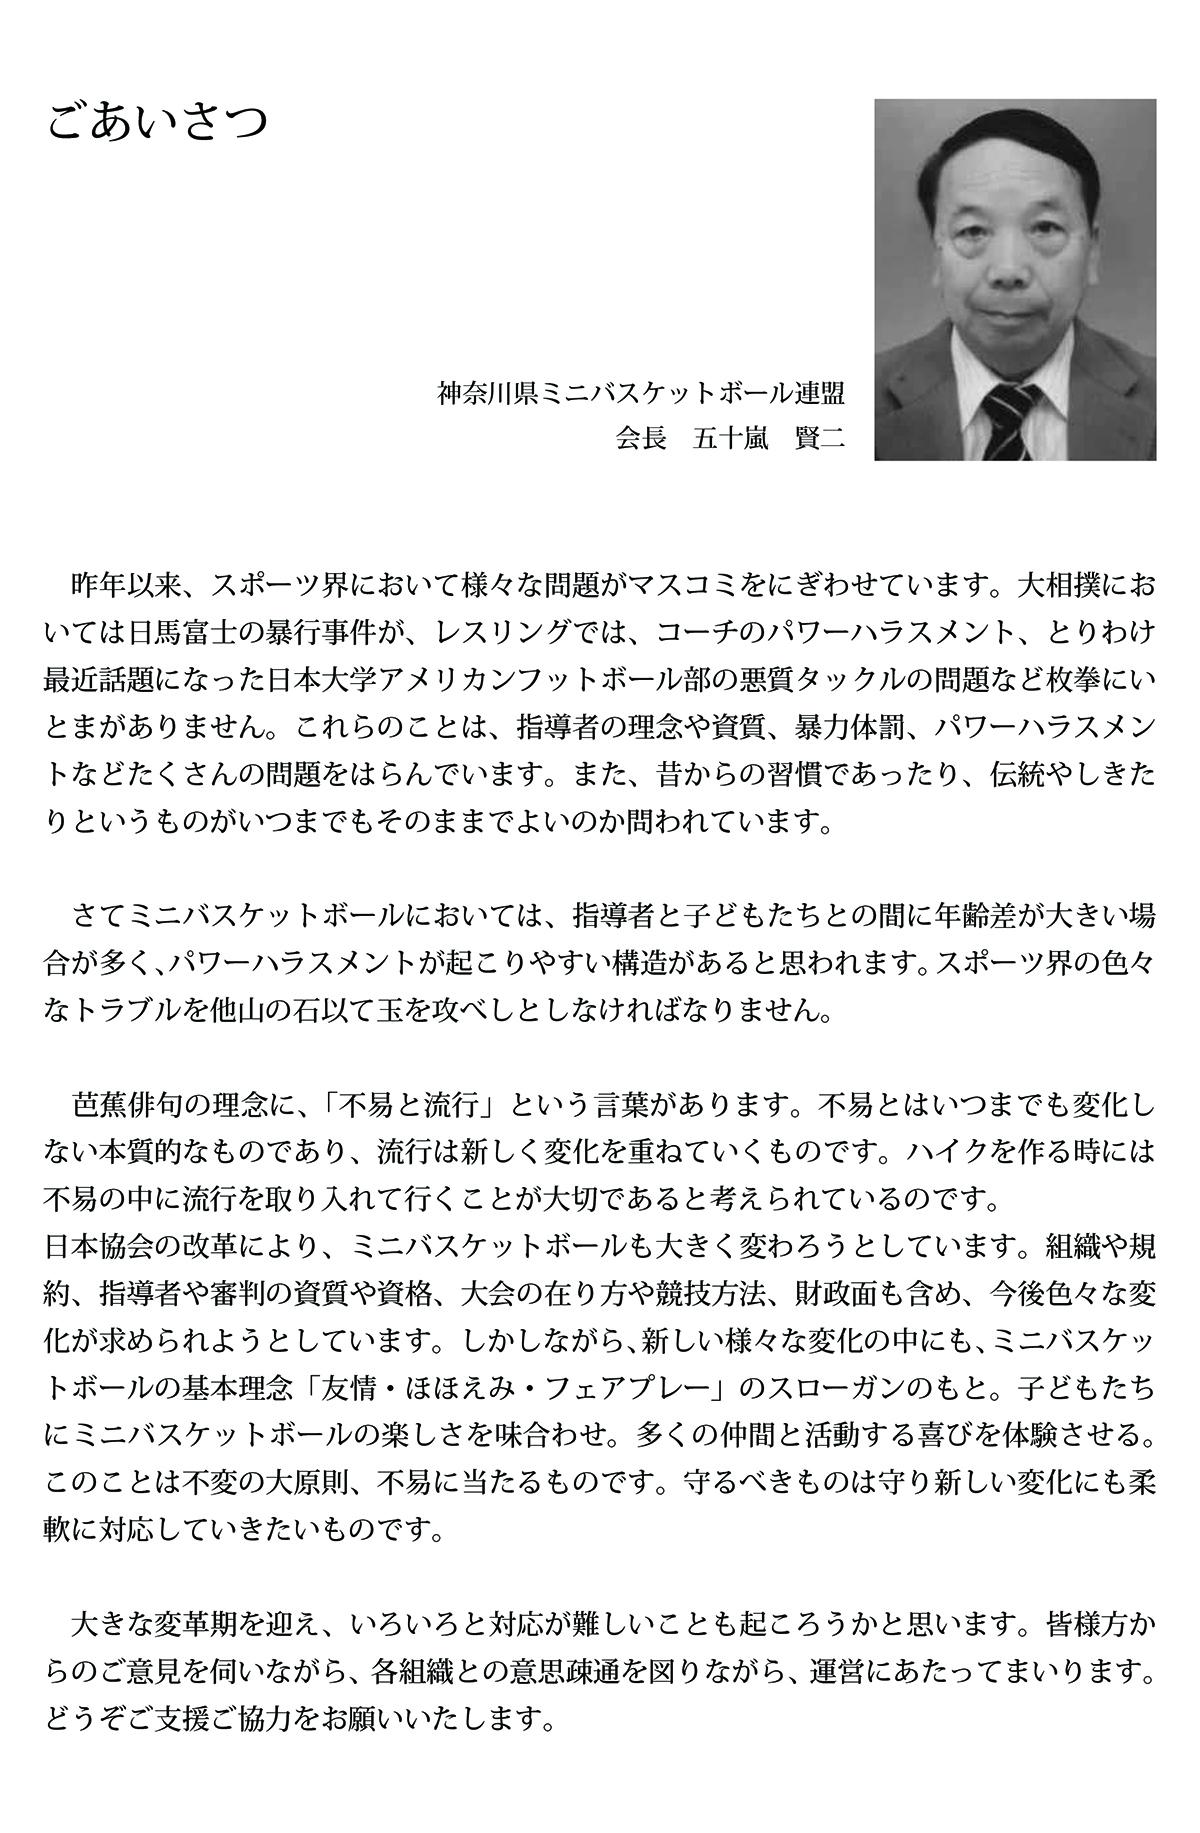 0-5Kanagawa_インデックス以下.pdf